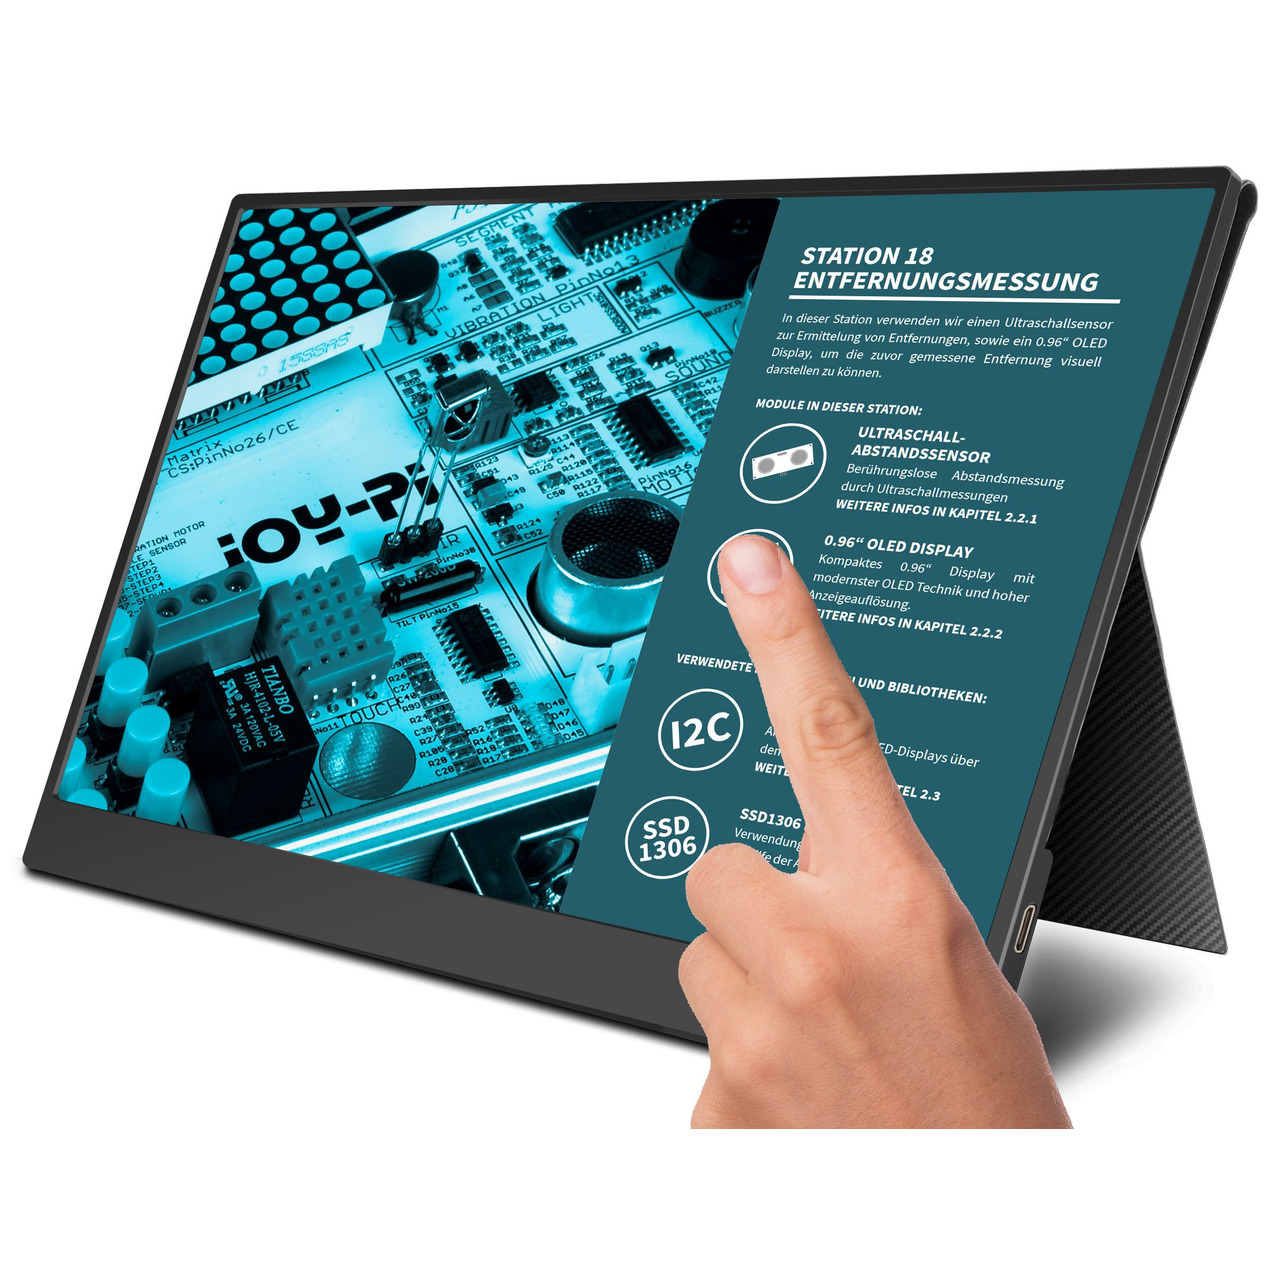 JOY-iT Tragbarer 15-6undquot  Touchscreen-Monitor - Zweitmonitor- inkl- Smart Case Hund-252 lle